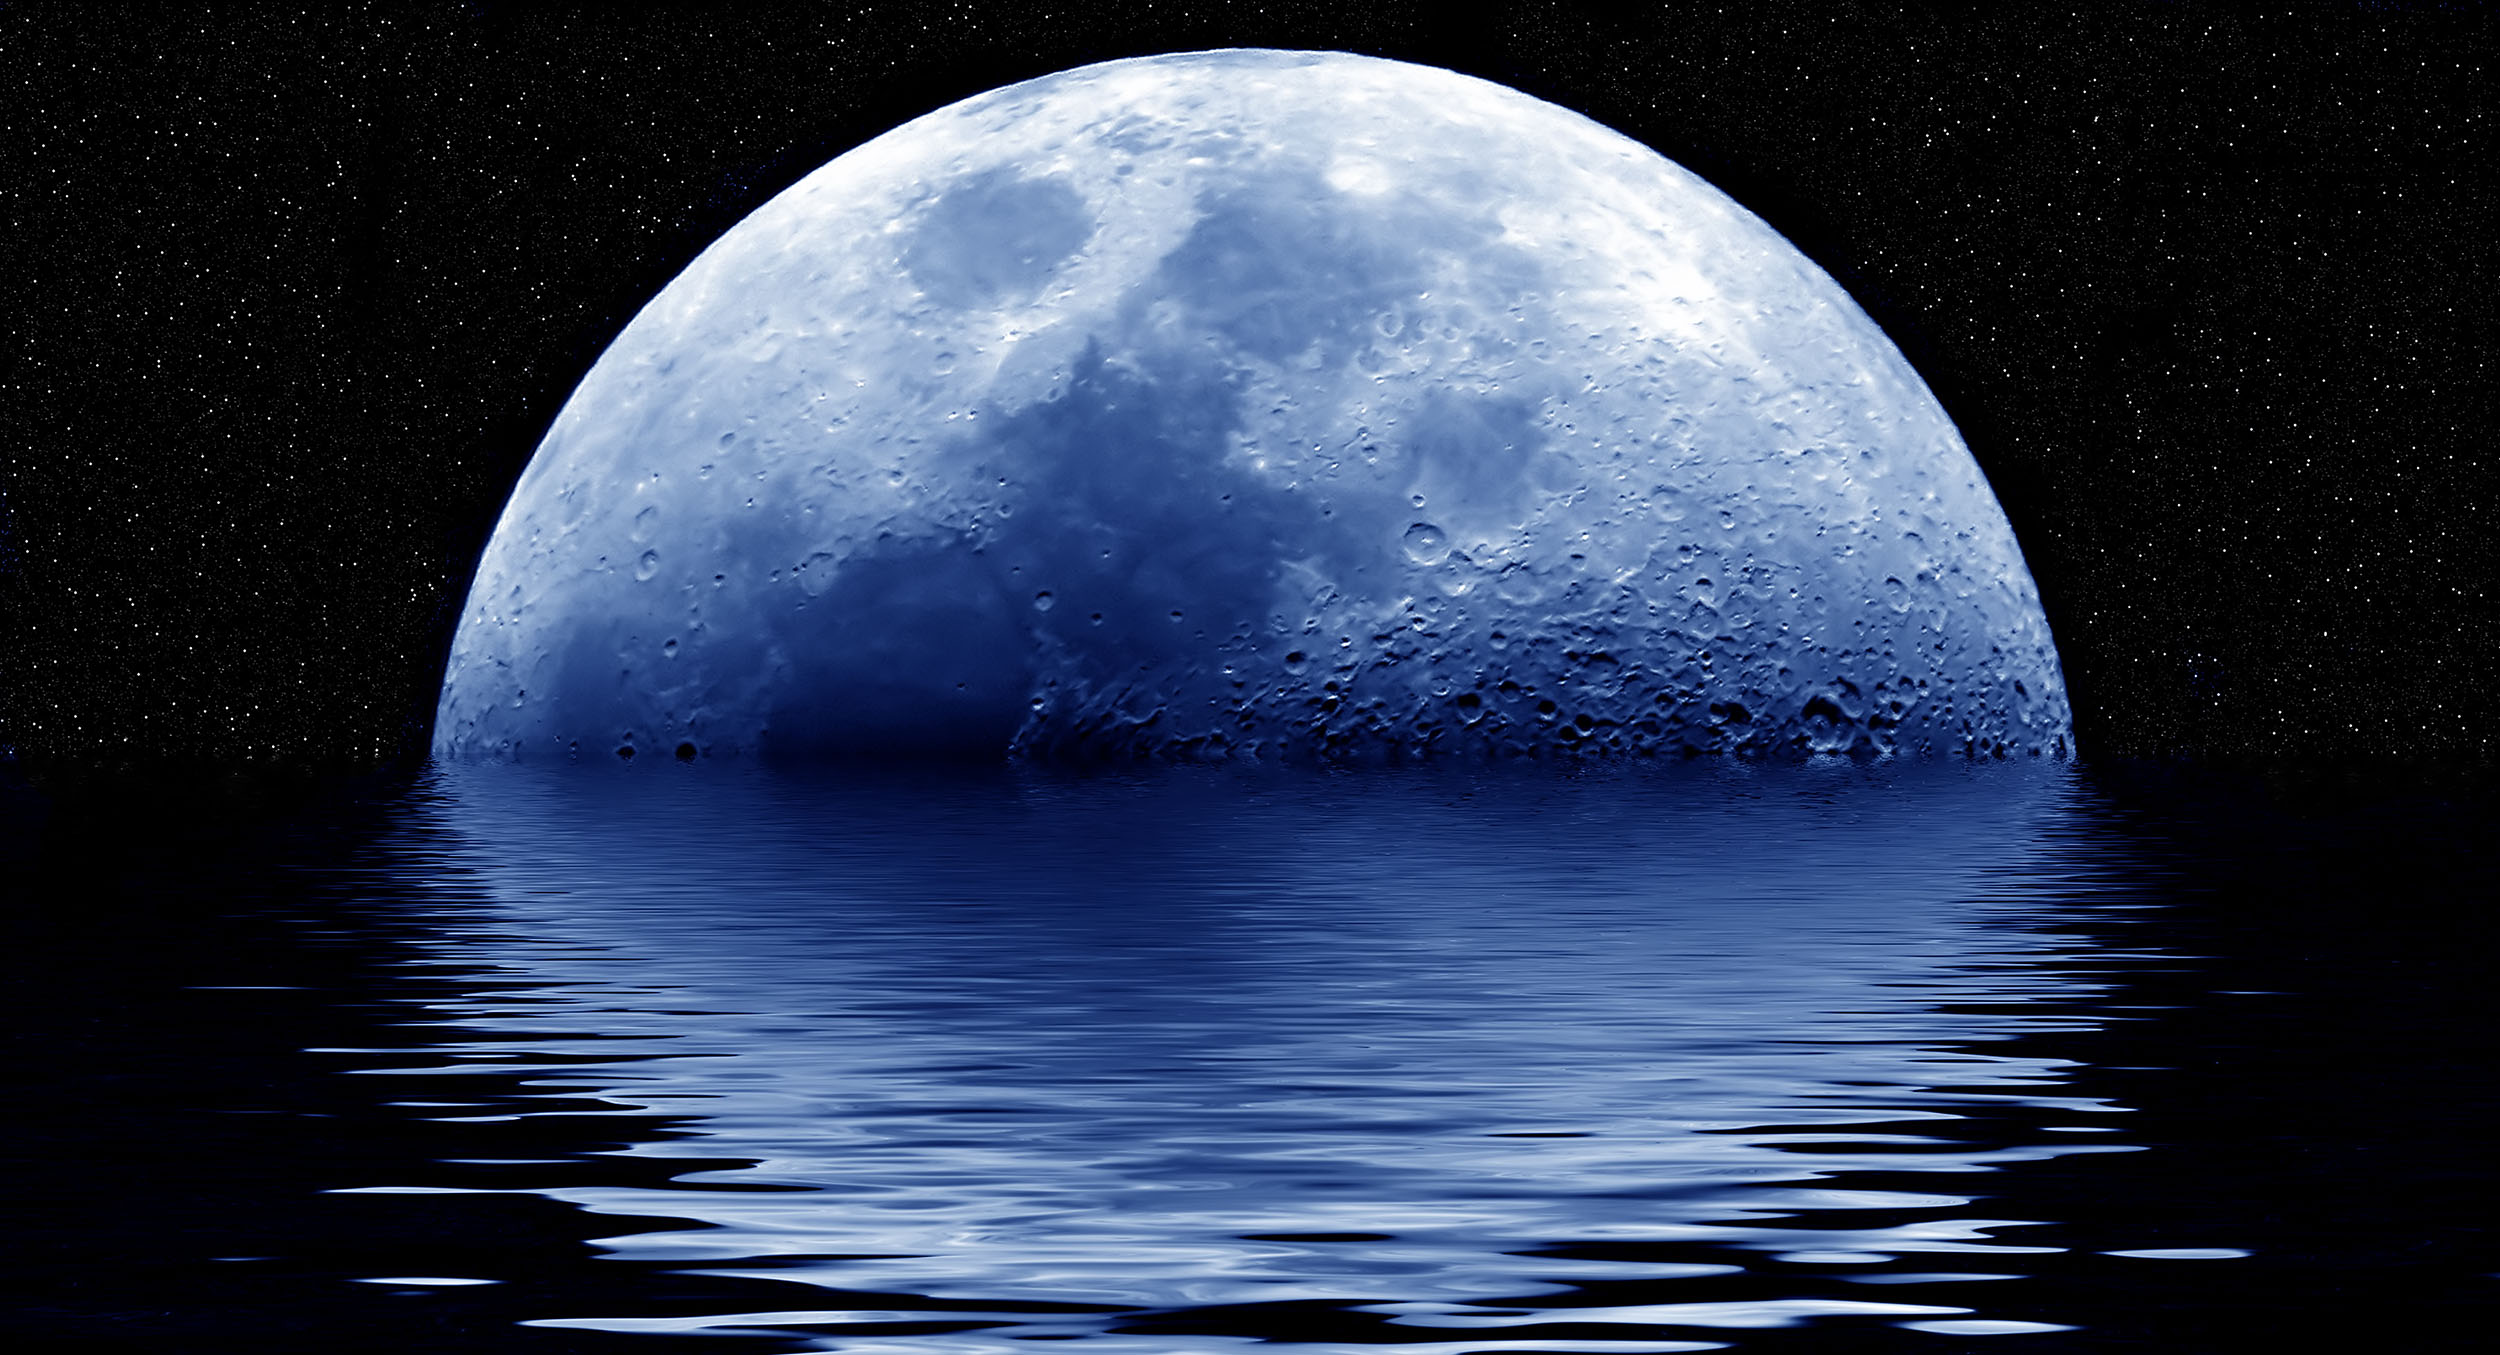 Indigo Moon Academy Of Pagan, Witchcraft & Occult Studies